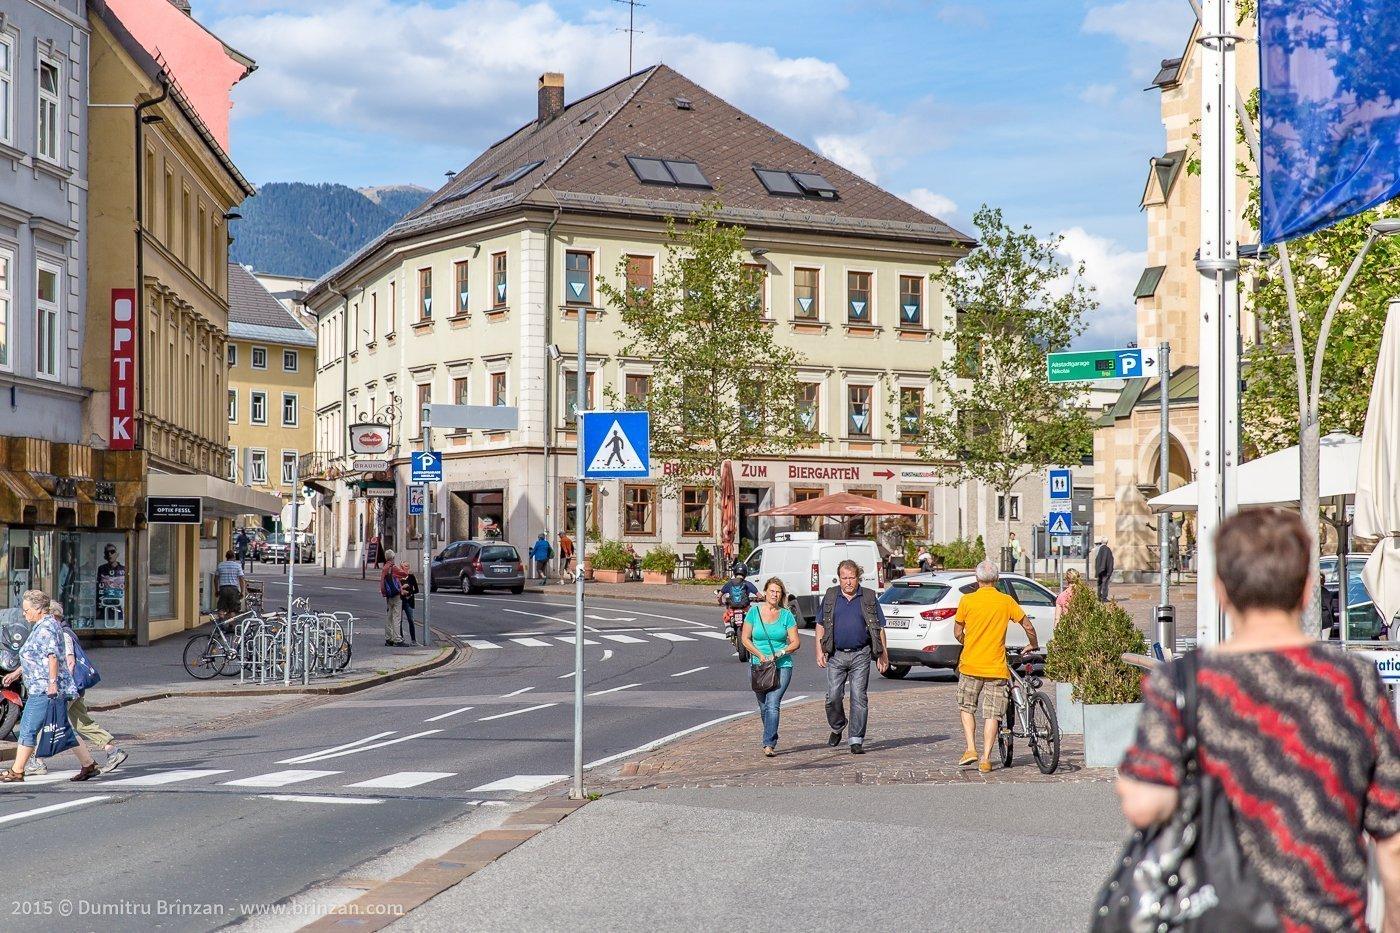 2015-september-villach-austria-6